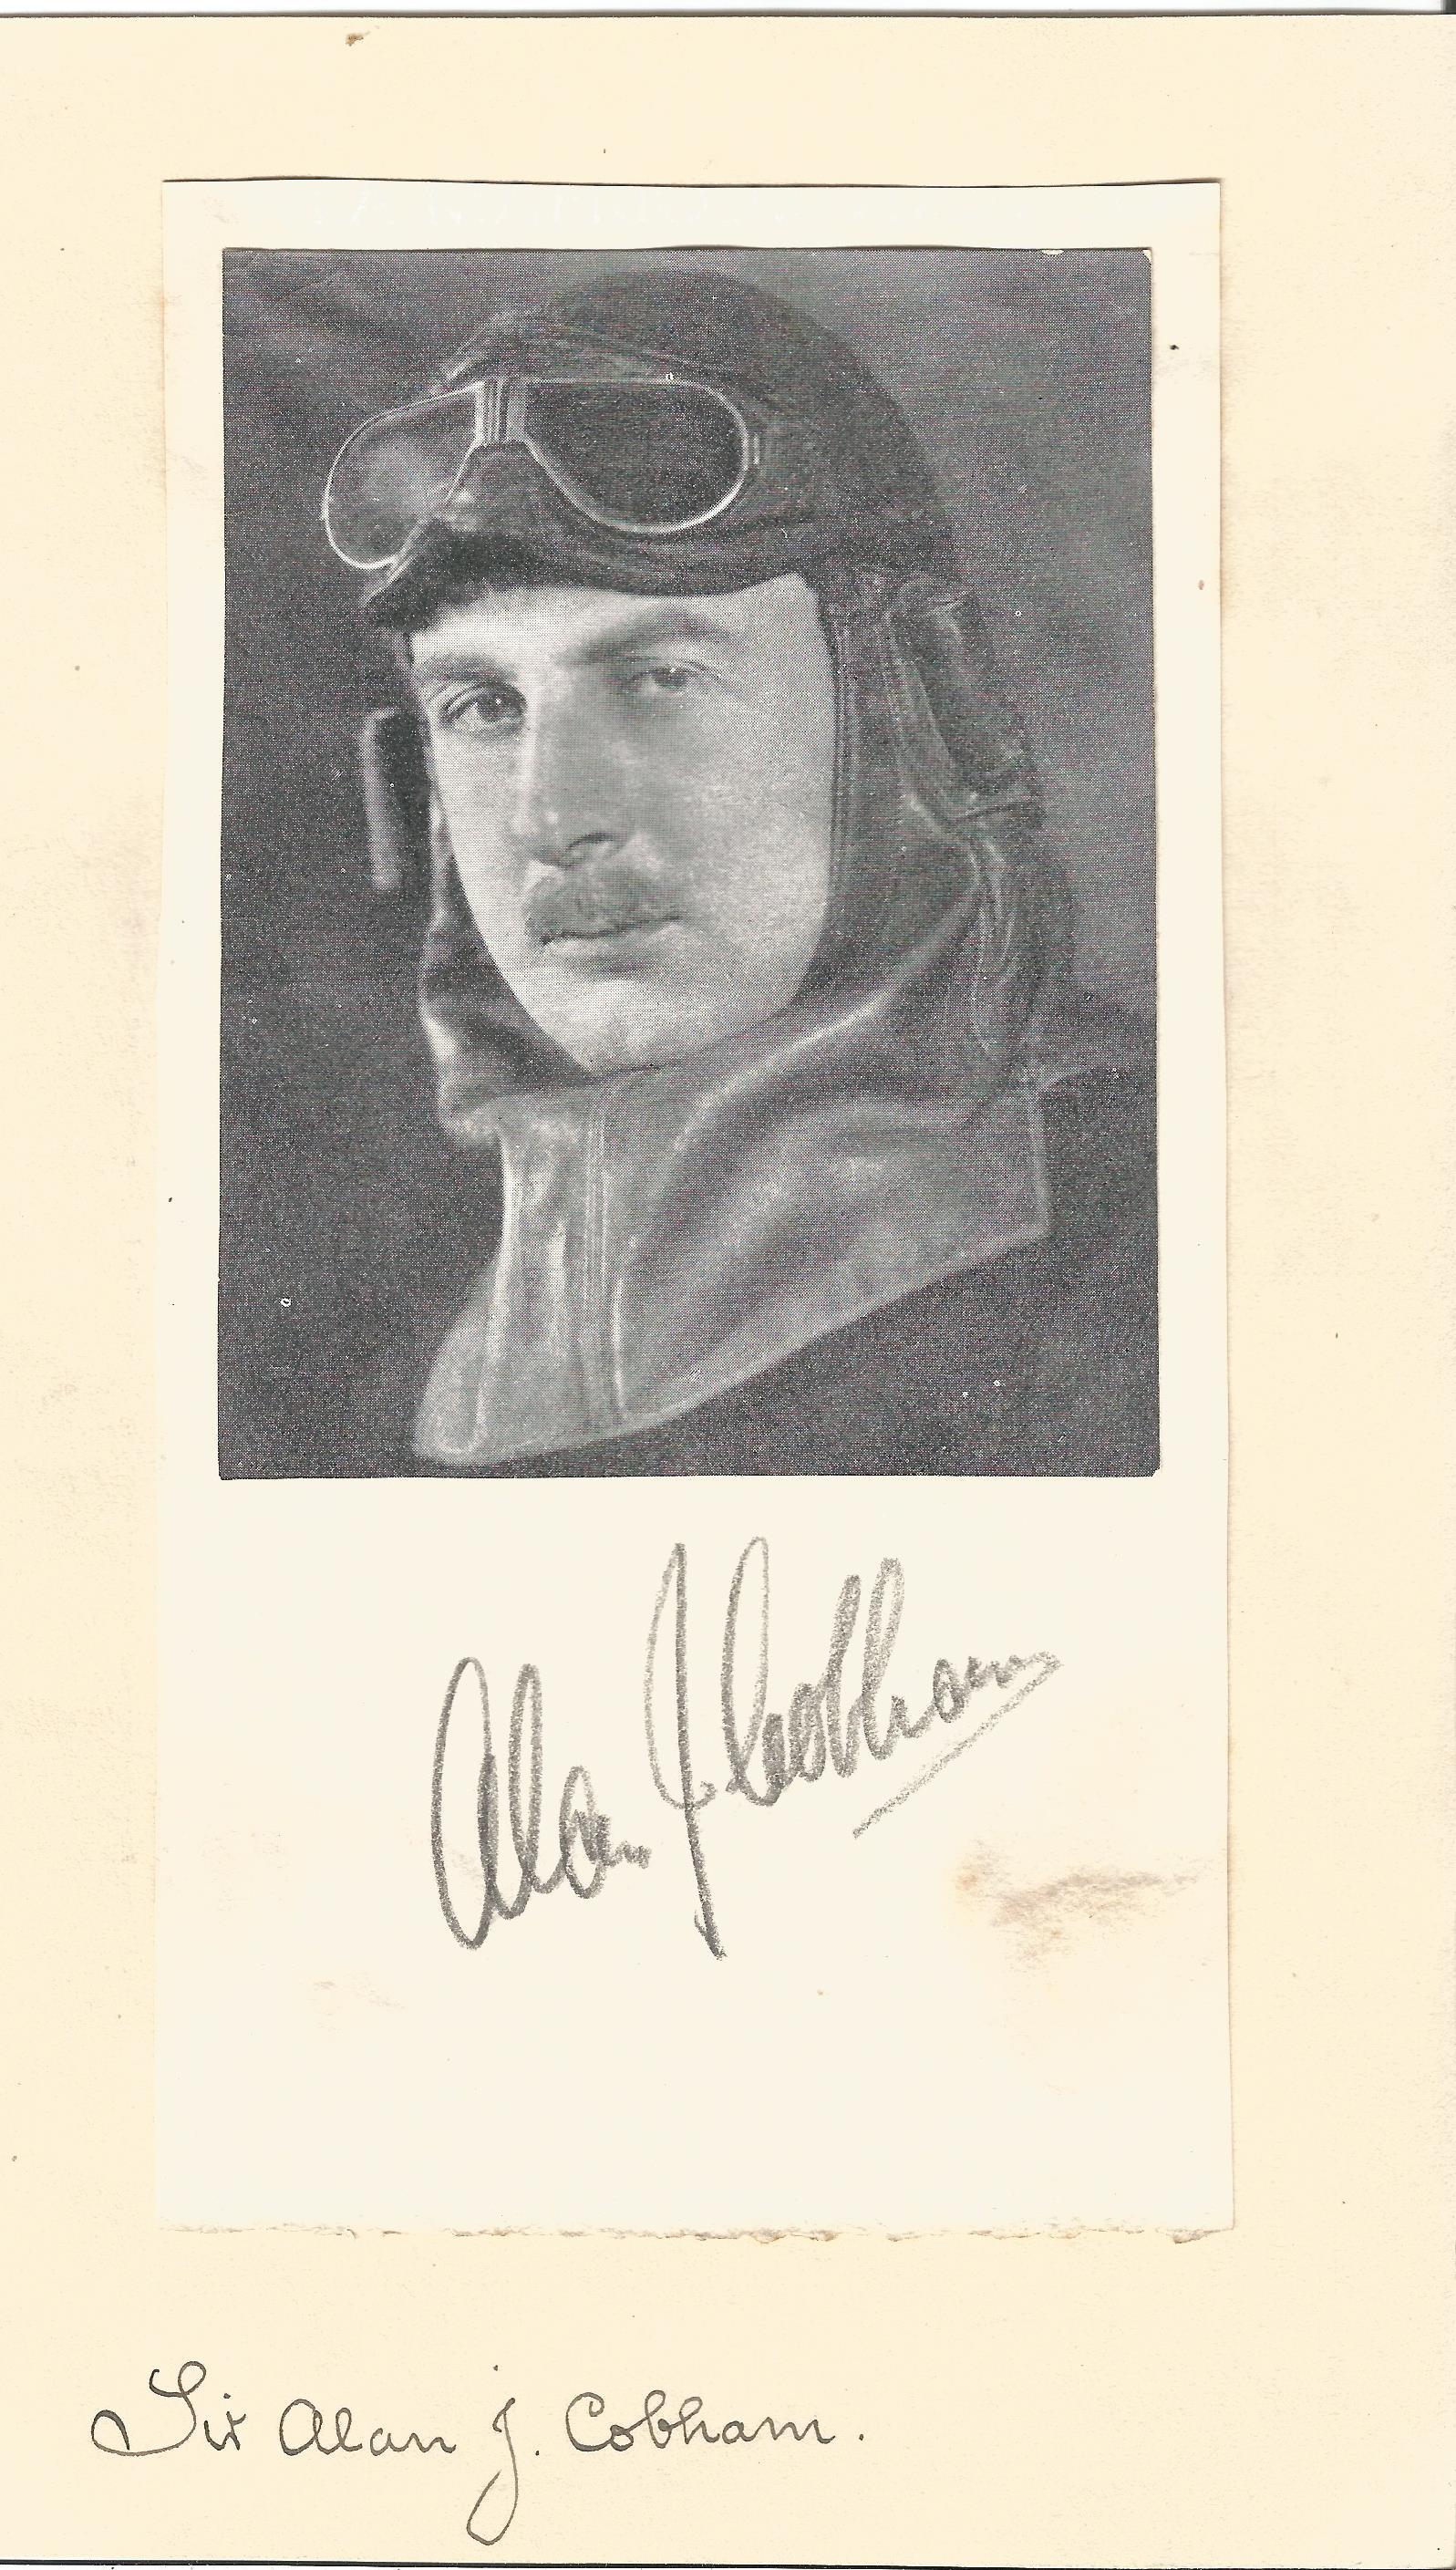 Lot 48 - Alan Cobham autograph mounted with b/w magazine photo. Good condition Est.